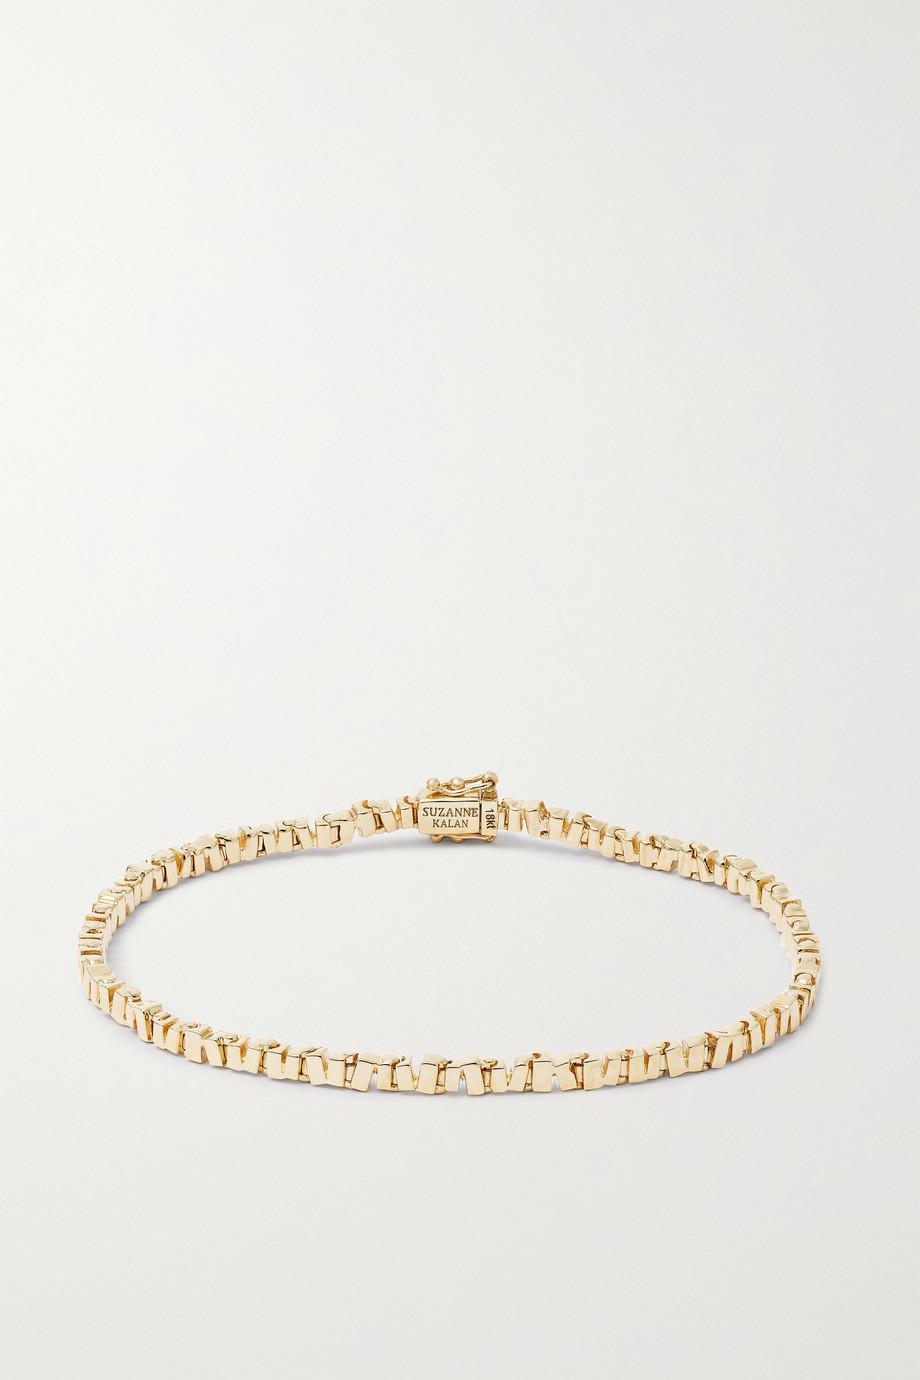 Suzanne Kalan Bracelet en or 18 carats (750/1000)